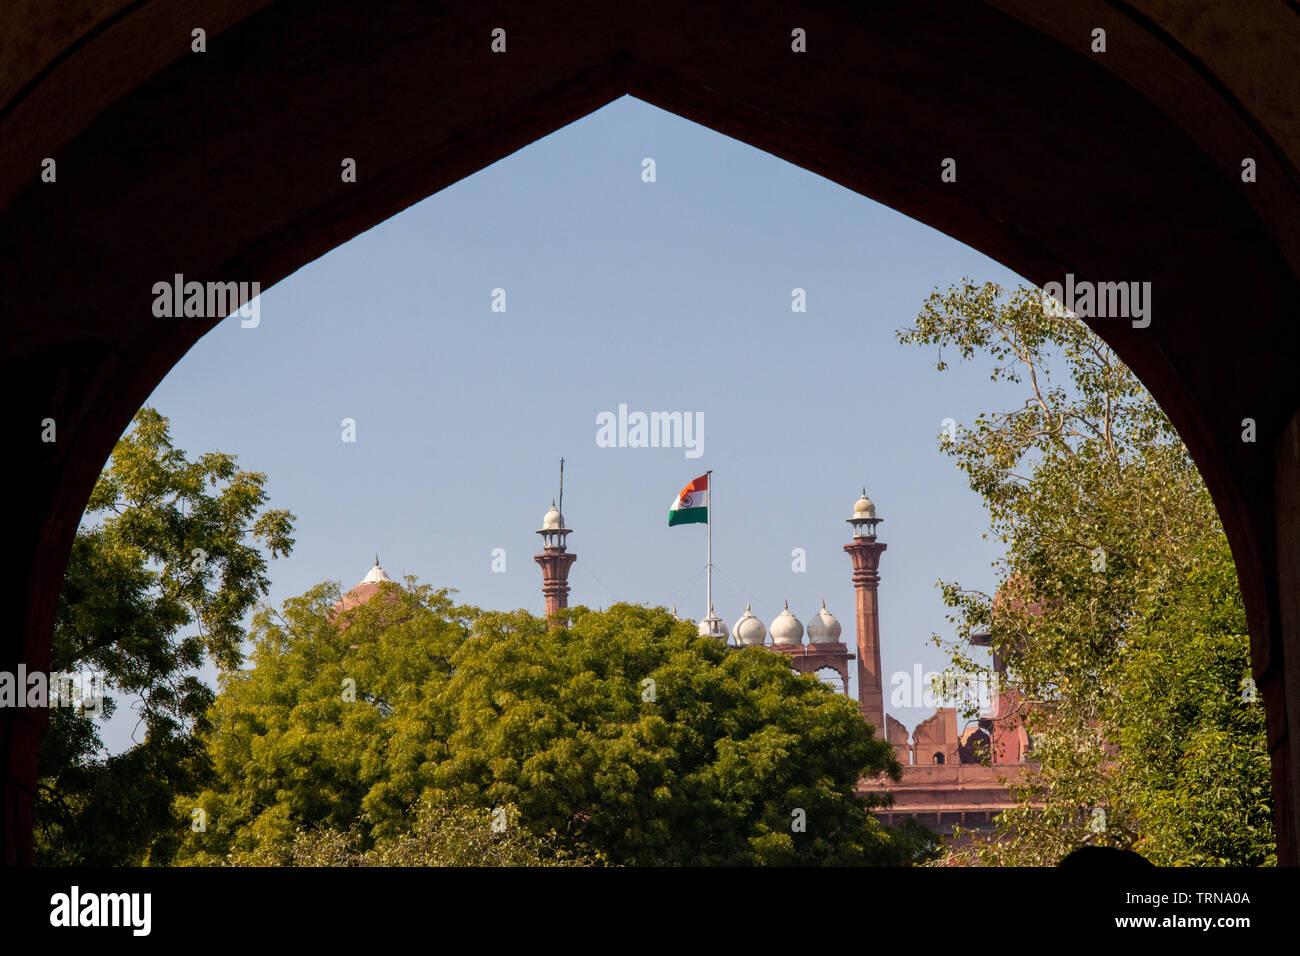 Red Fort Delhi, India framed through a inside curved entrance gate. - Stock Image